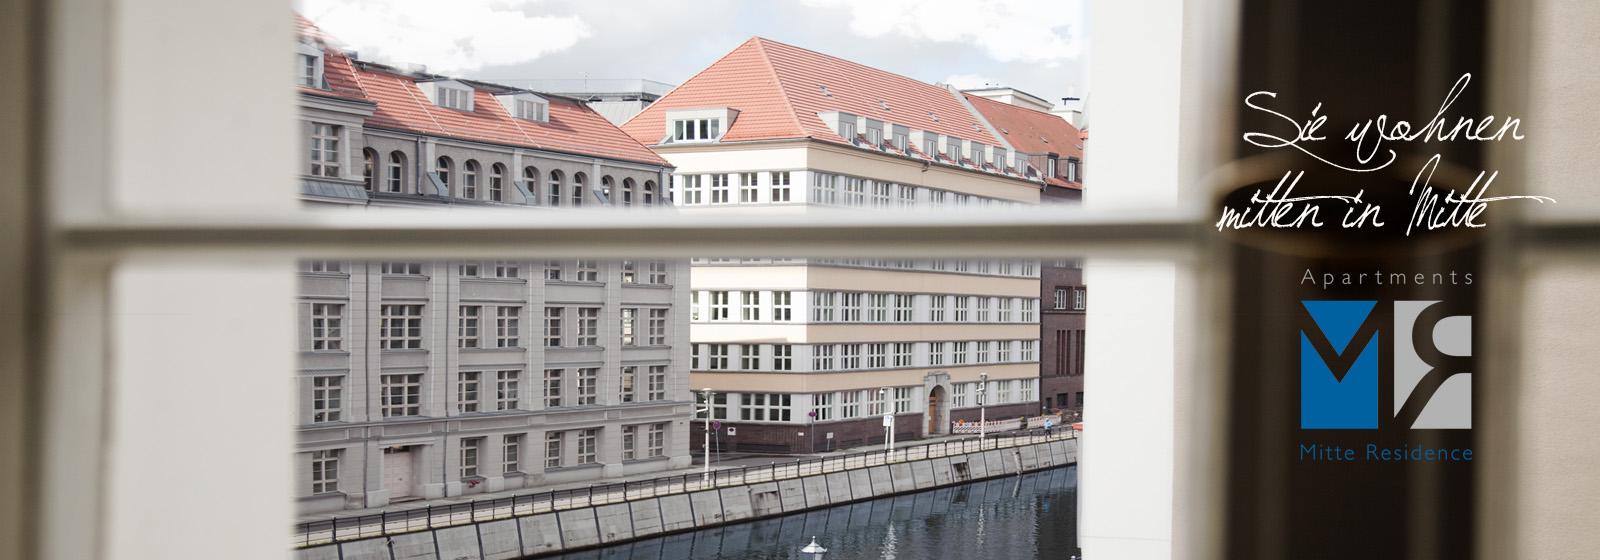 mitte-seeblick-berlin-apartments-copy